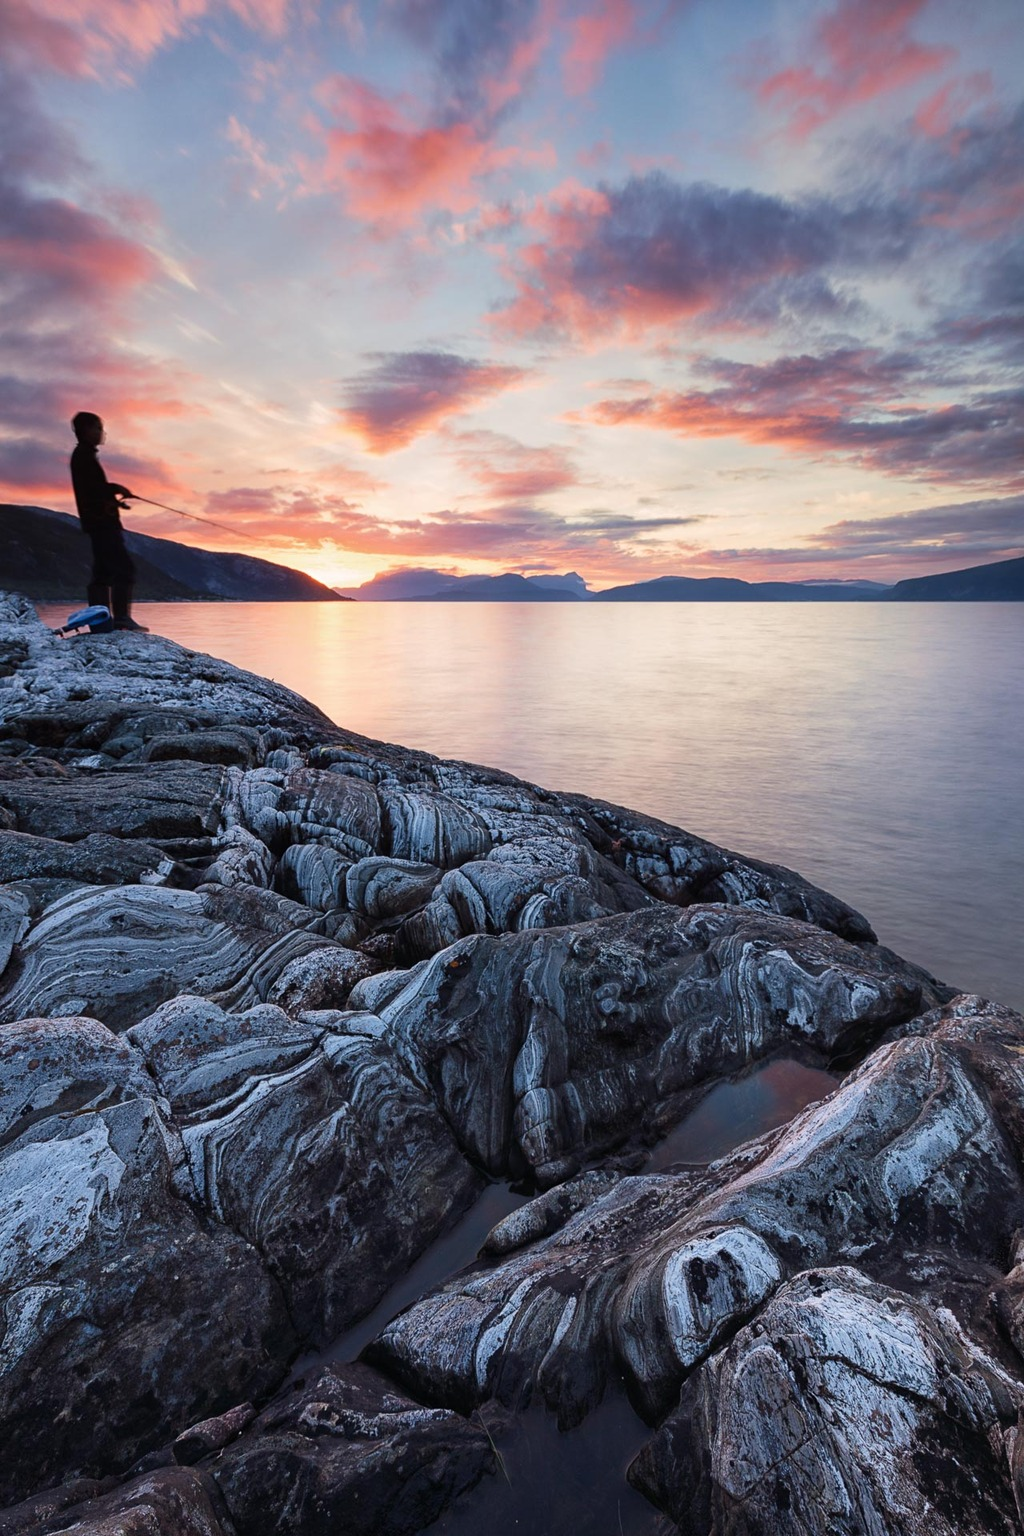 A Fisherman's Sunset - Canon EOS 5Dsr + Canon EF 16-35mm f/4 L IS op 16mm, iso 100, f/14, 4 sec. exposure, Lee ND9 hard grad, Lee ND9, statief en draadontspanner.